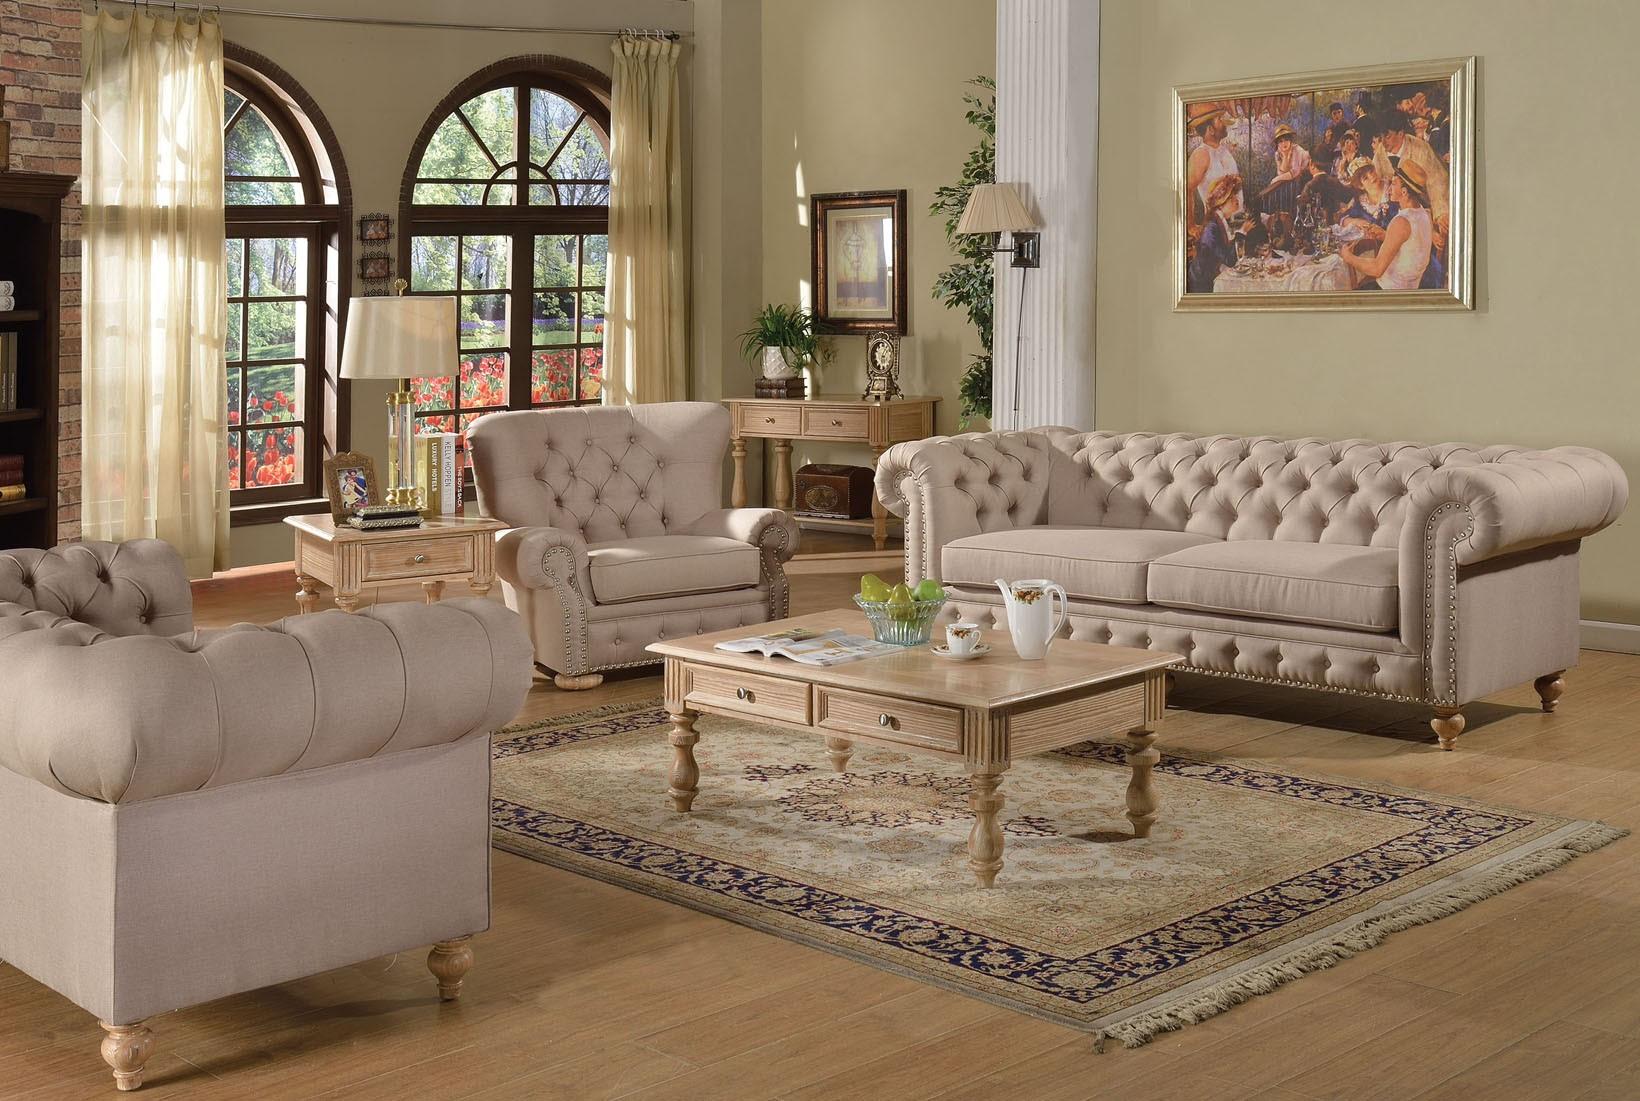 2pc Sofa Set Beige Fabric Traditional Living Room | Hot ...